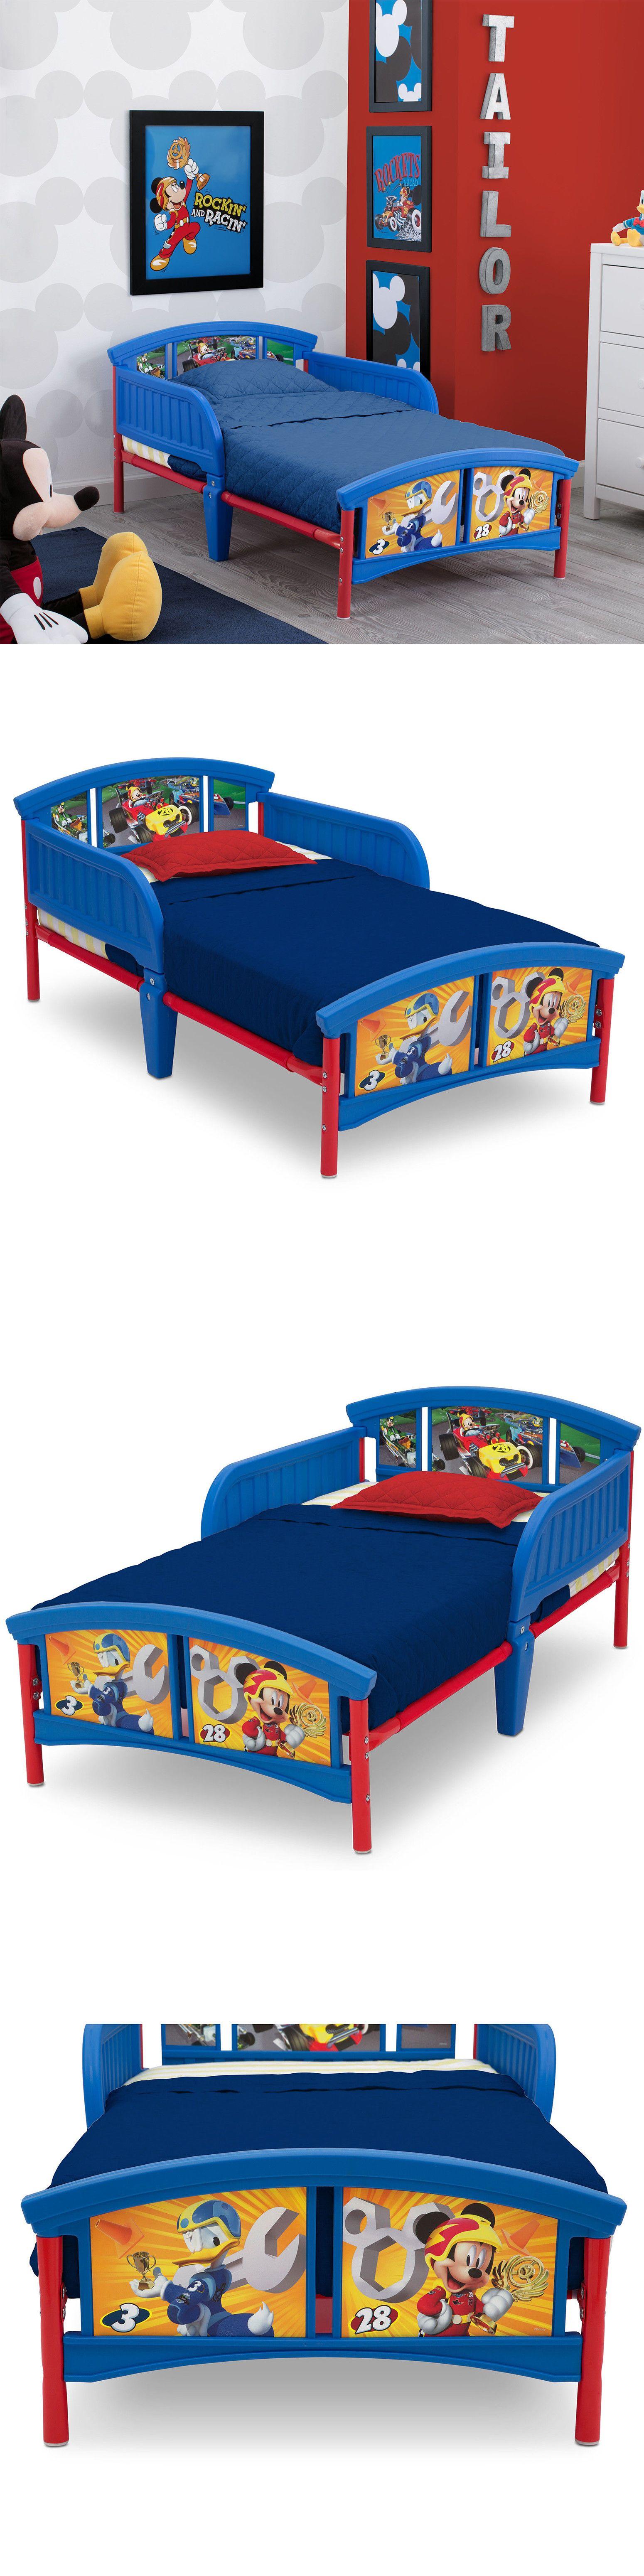 Bedroom Furniture 66742 Disney Mickey Mouse Plastic Steel Toddler